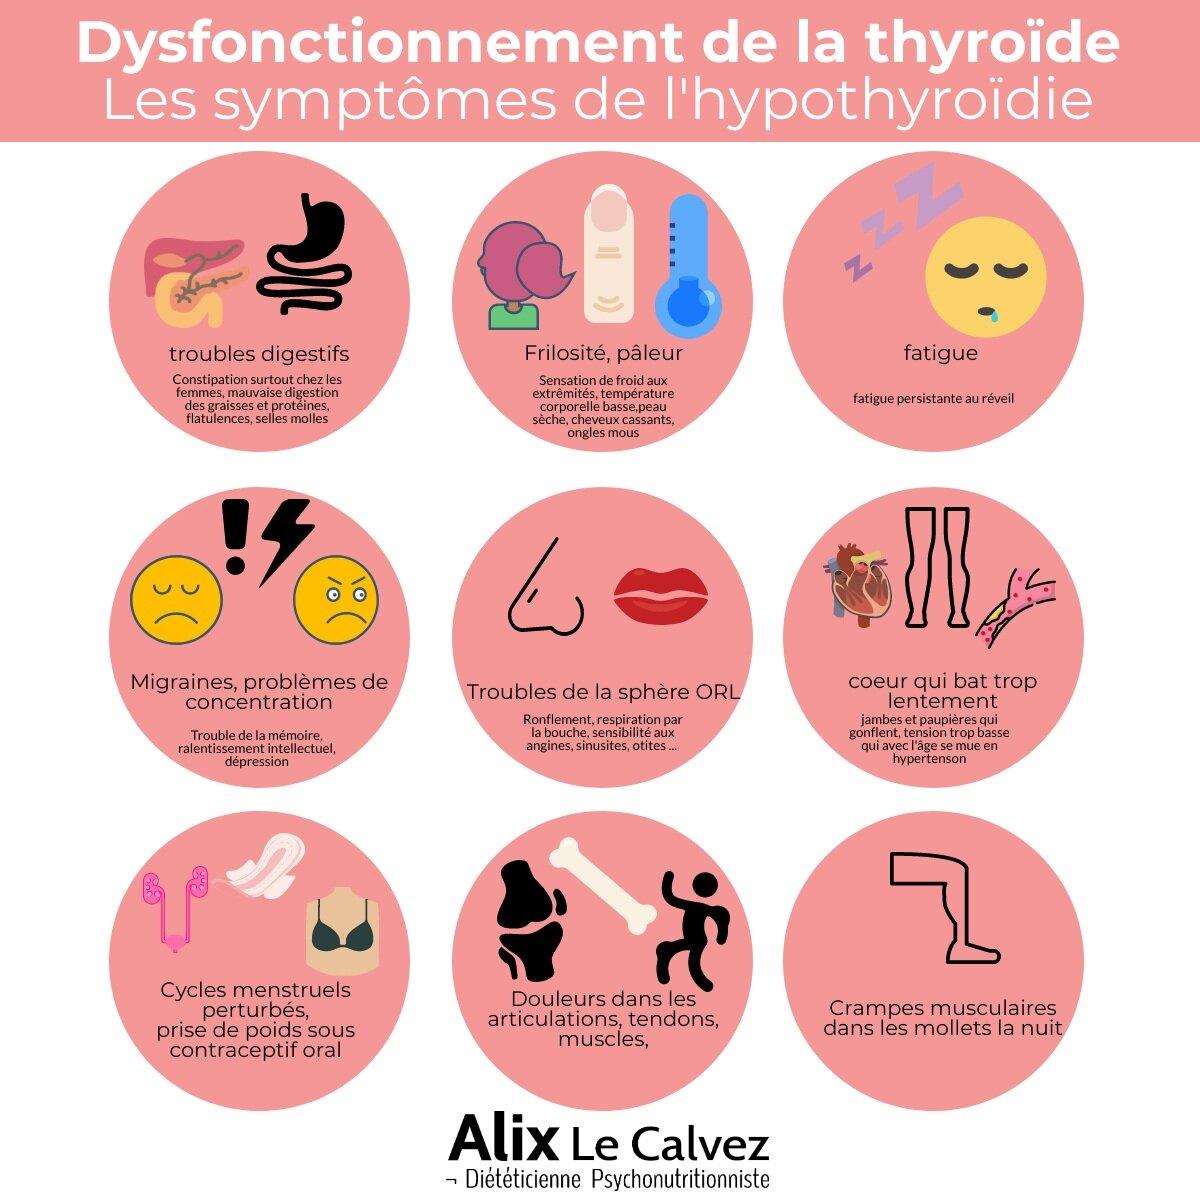 Comment utiliser Cytomel T3 pour perdre du poids - Myogen Blog